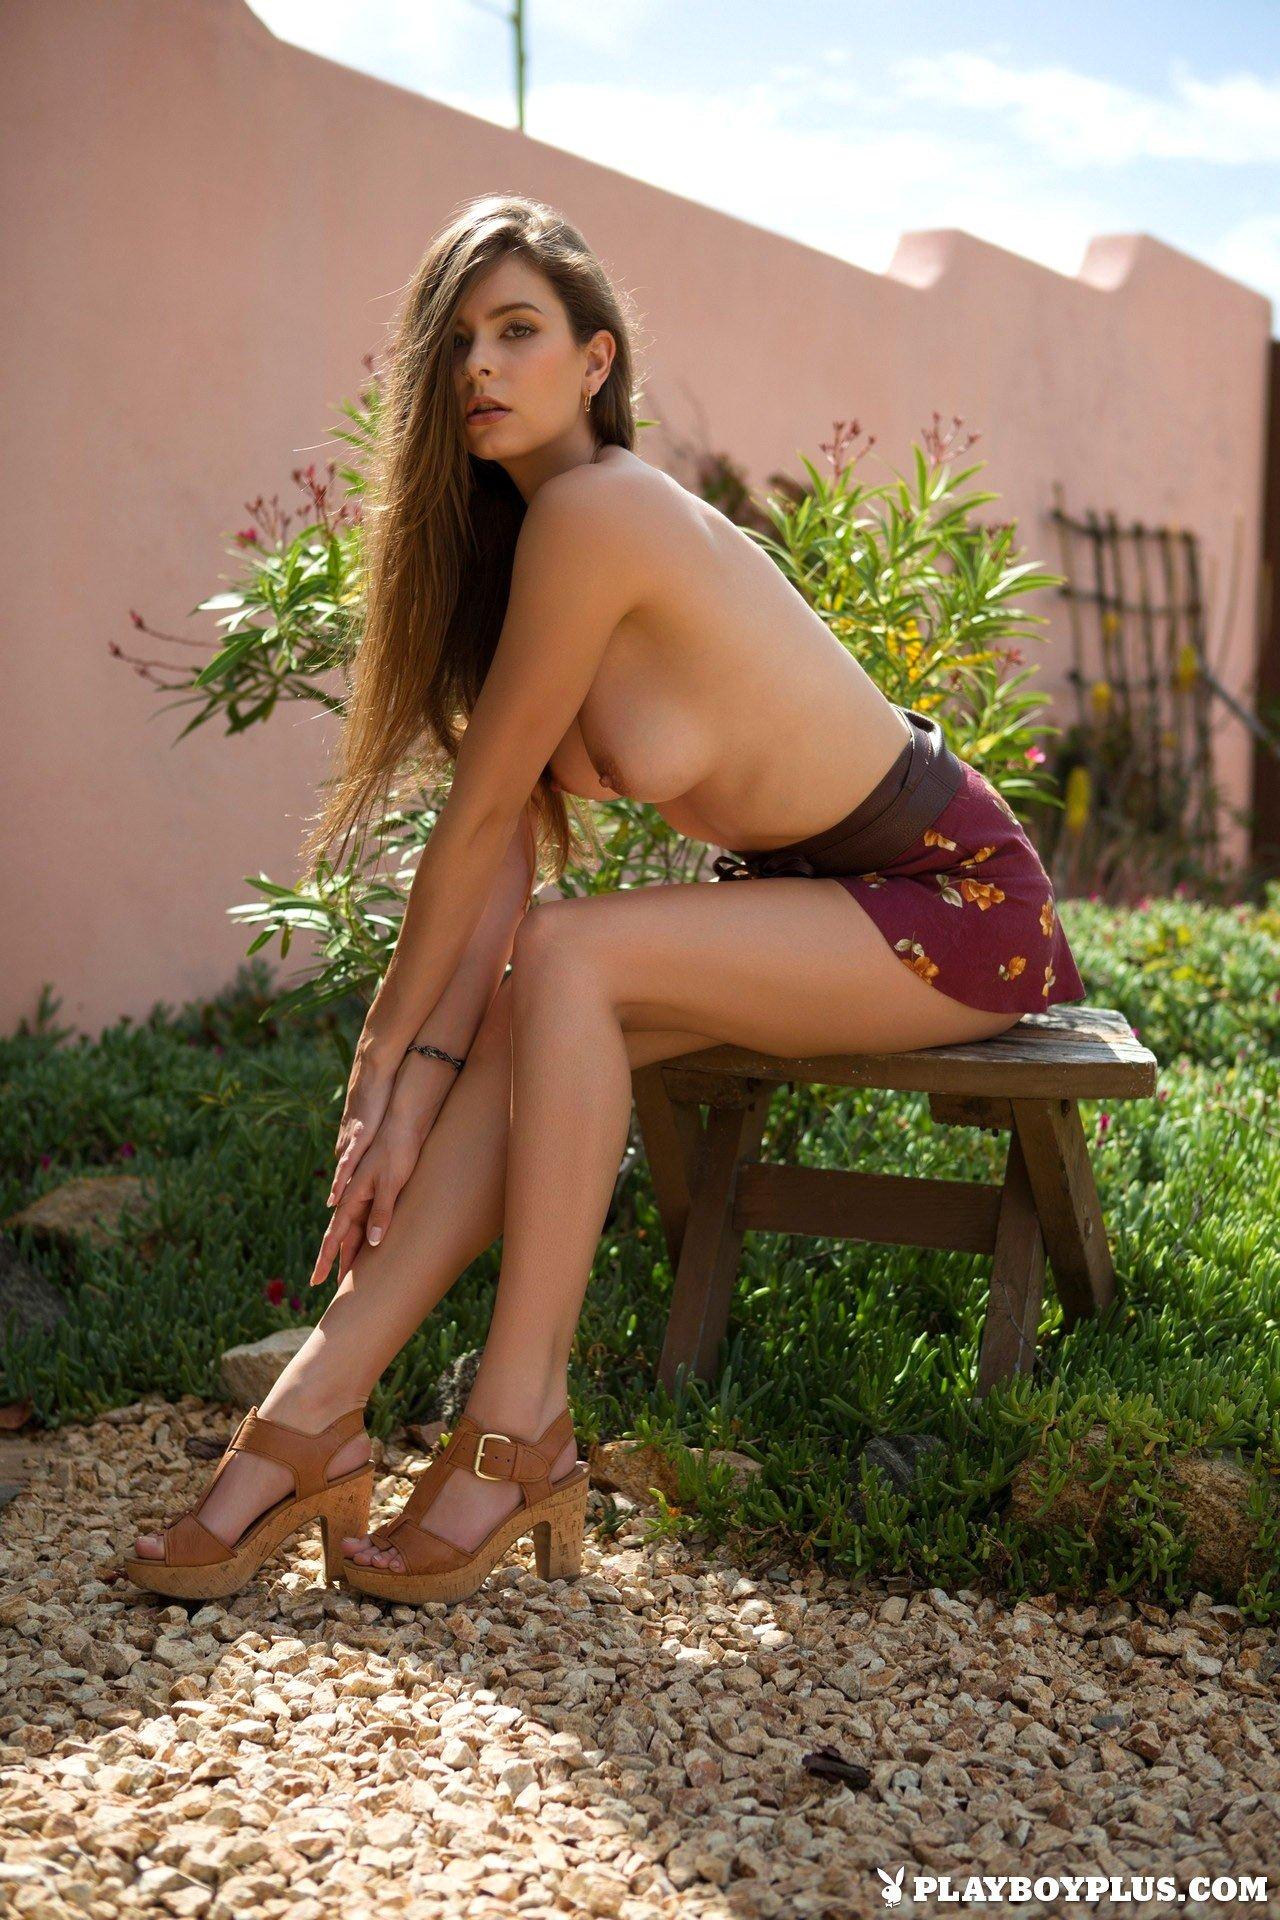 Amazing Cybergirl Lauren Lee drops down her summer outfit in courtyard for Playboy https://t.co/T7M6jwhX2b https://t.co/MqfE5lOzaL